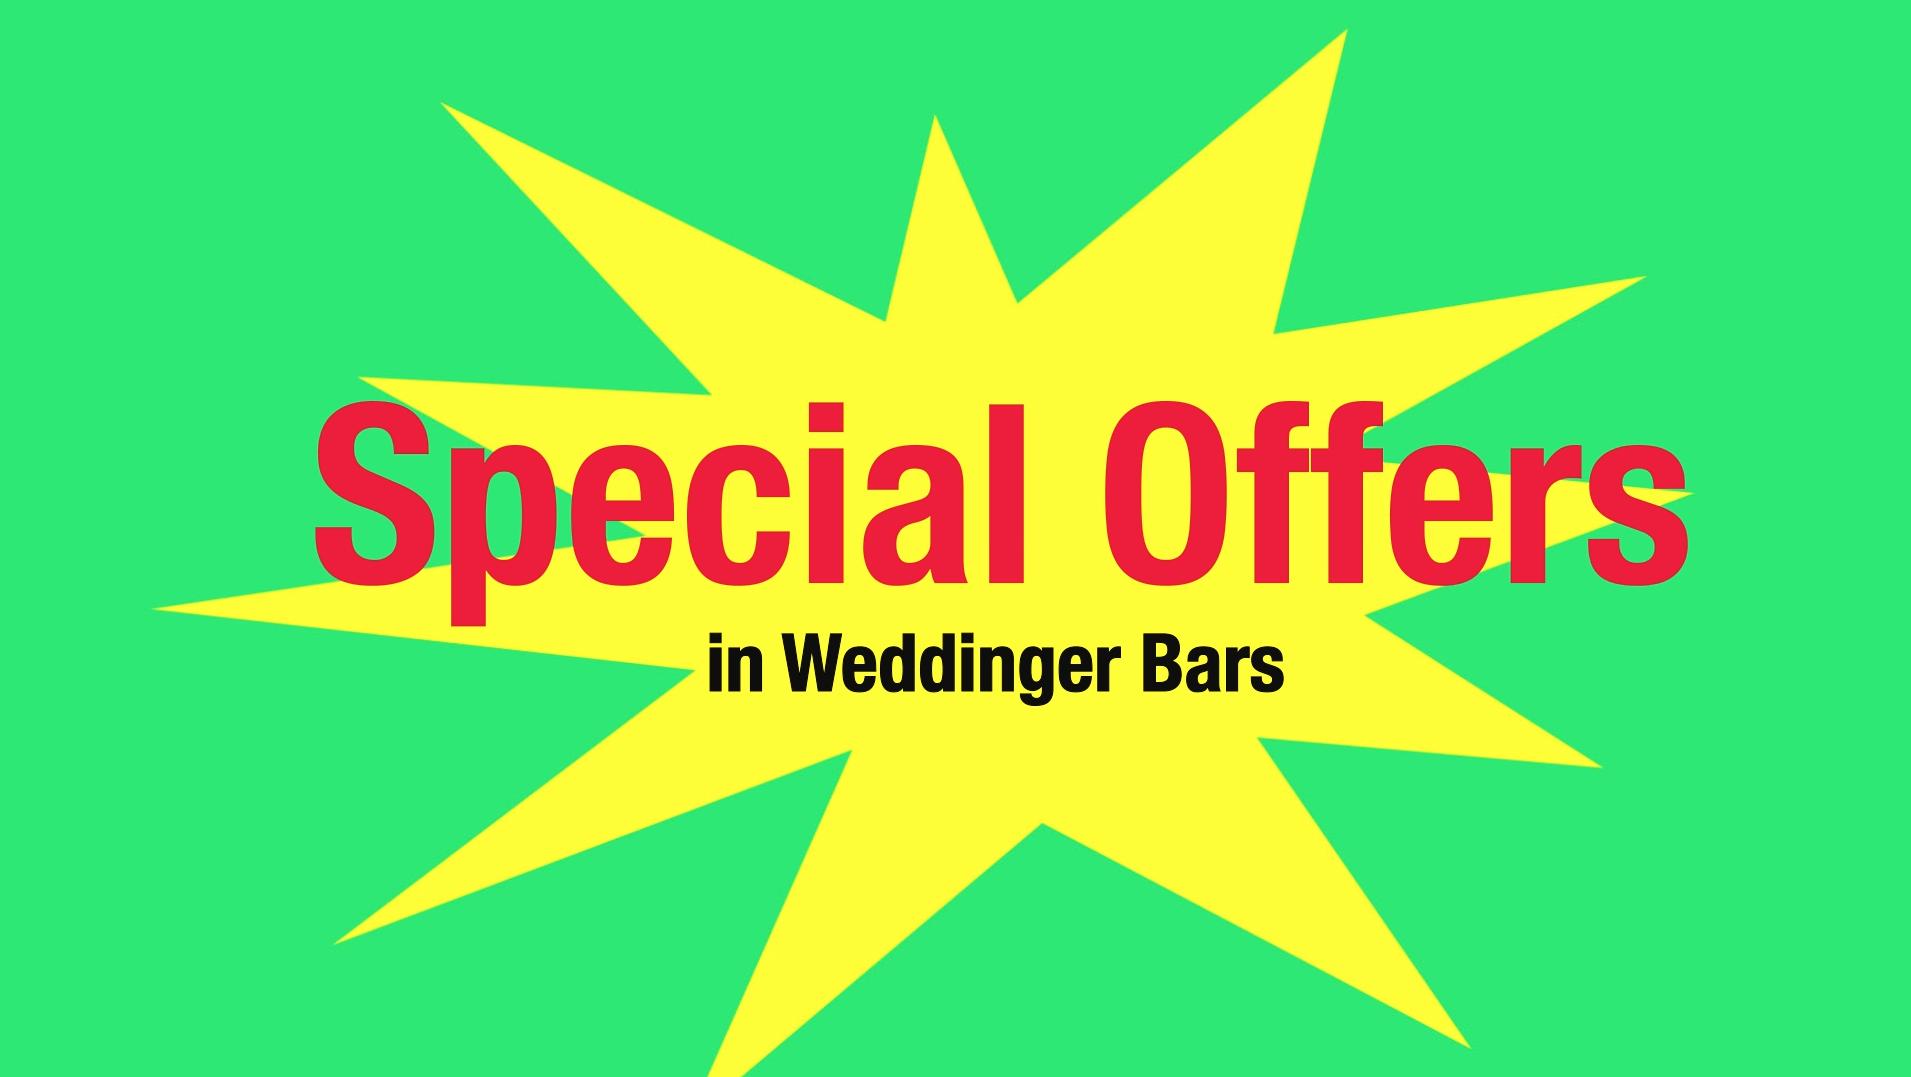 Special Offers: Weddinger Bars noch günstiger genießen